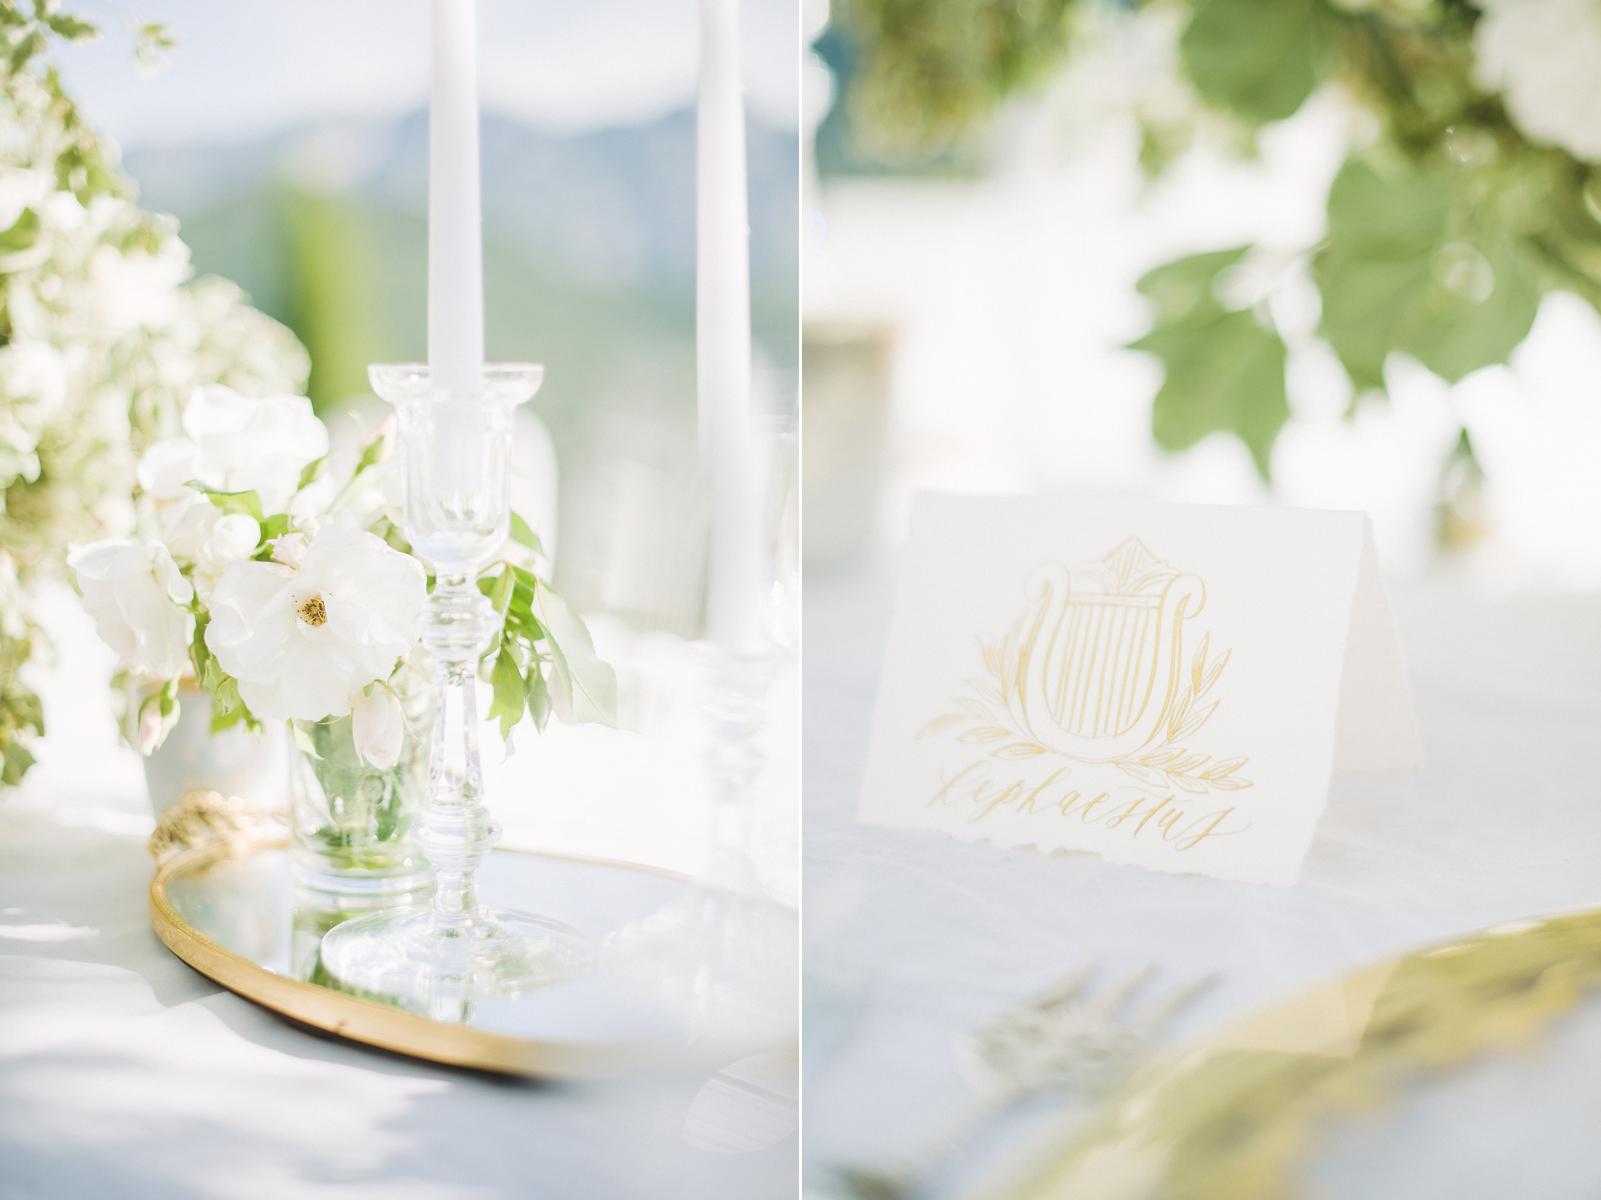 Boheme-Moon-wedding-photography-ravello-italy_11.jpg